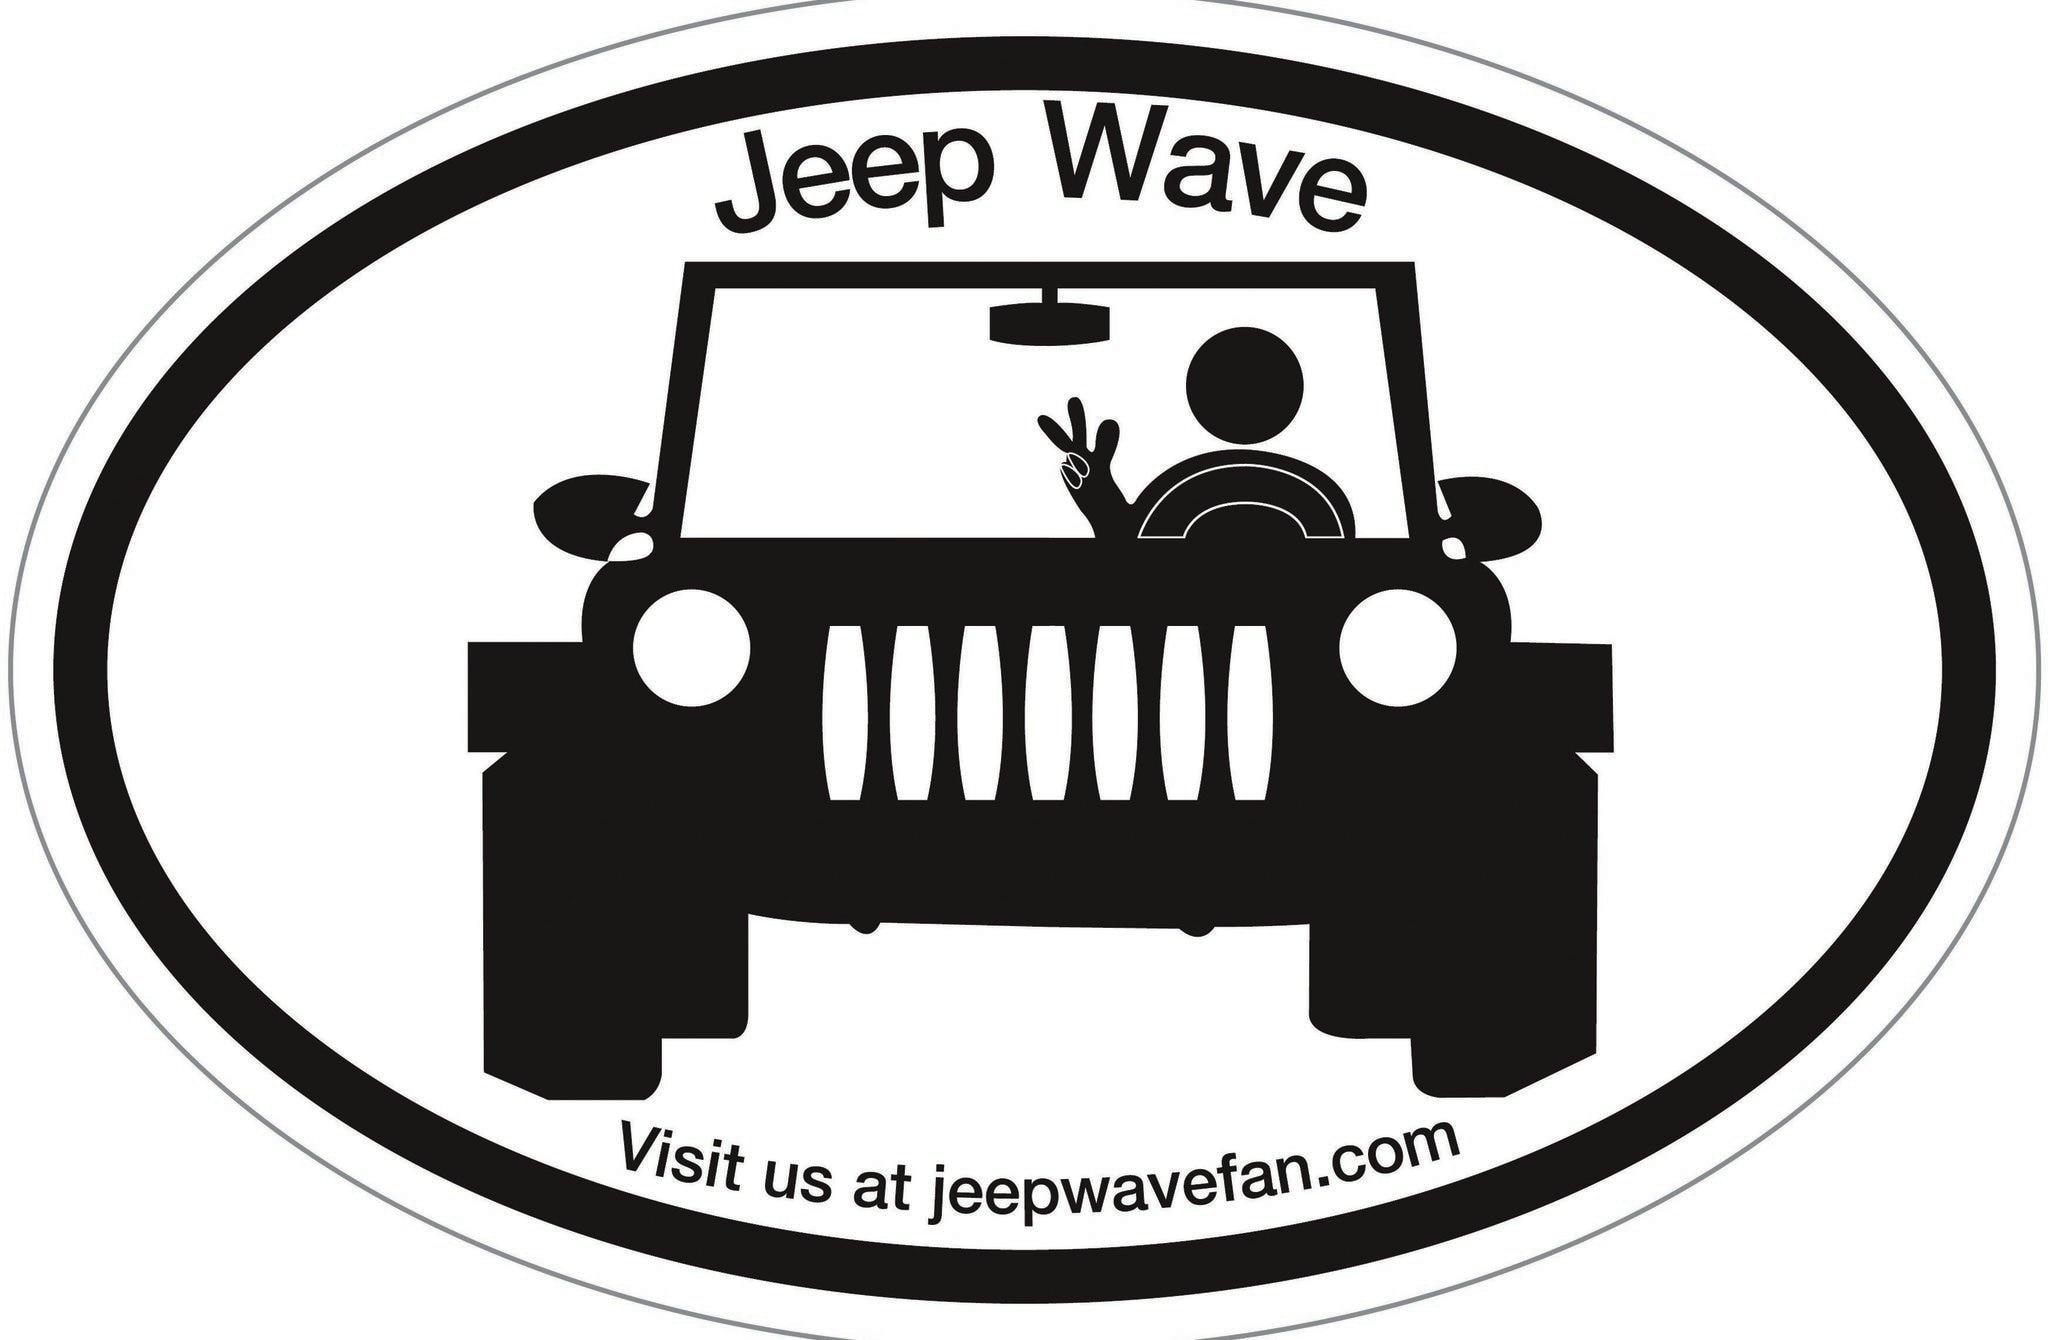 jeep wave sticker